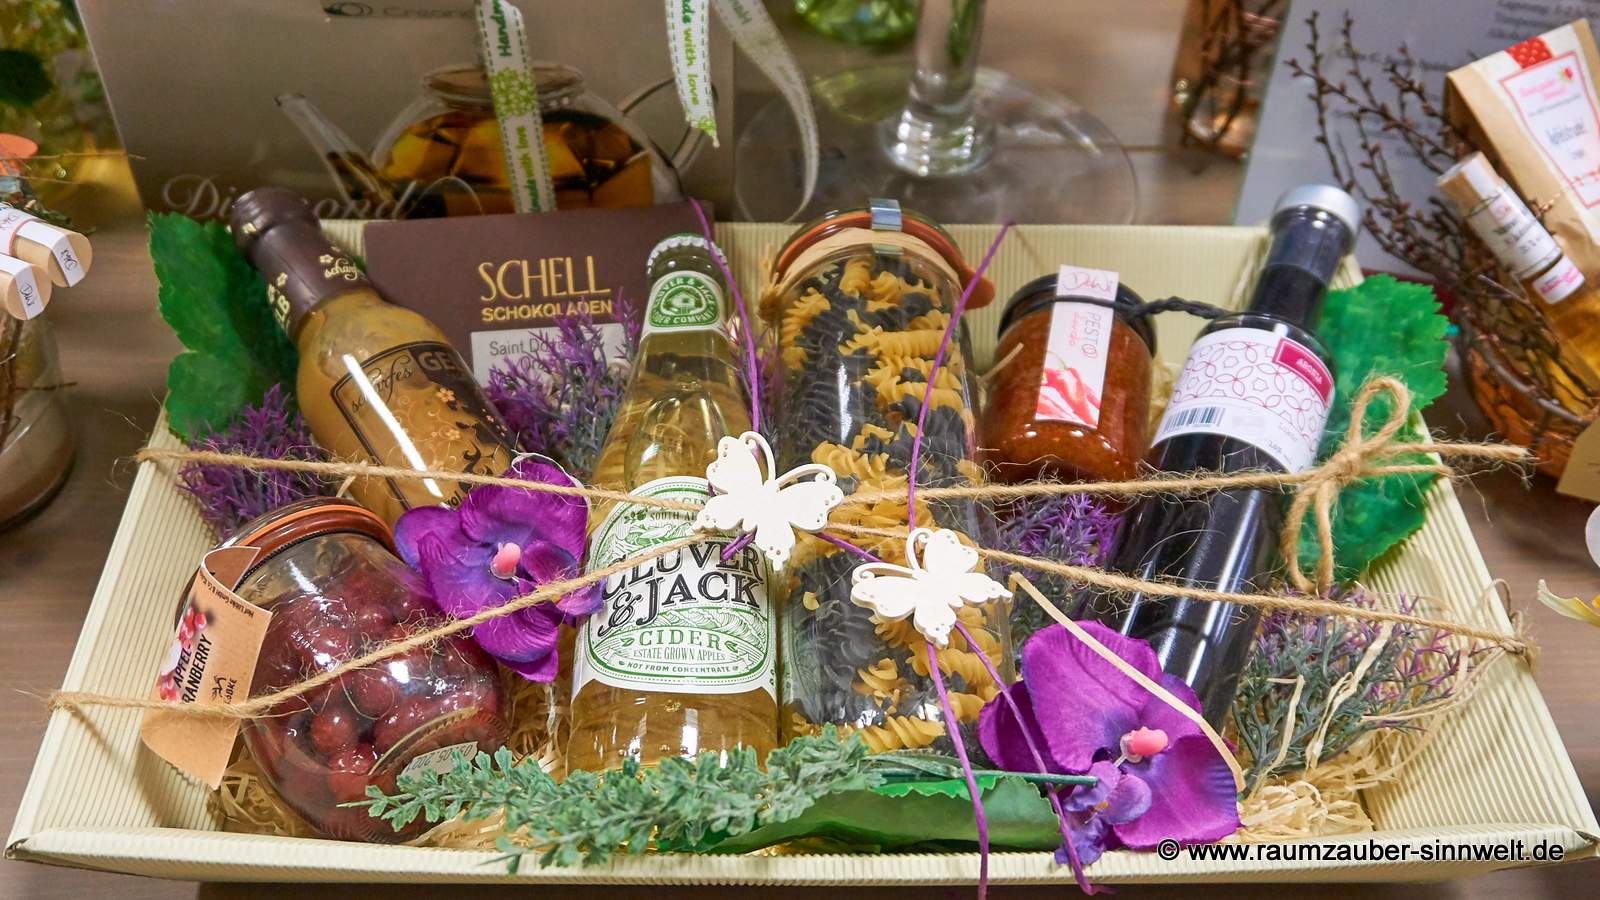 Präsentkorb mit Likör, Nudel, Pesto, Schokolade und Früchten